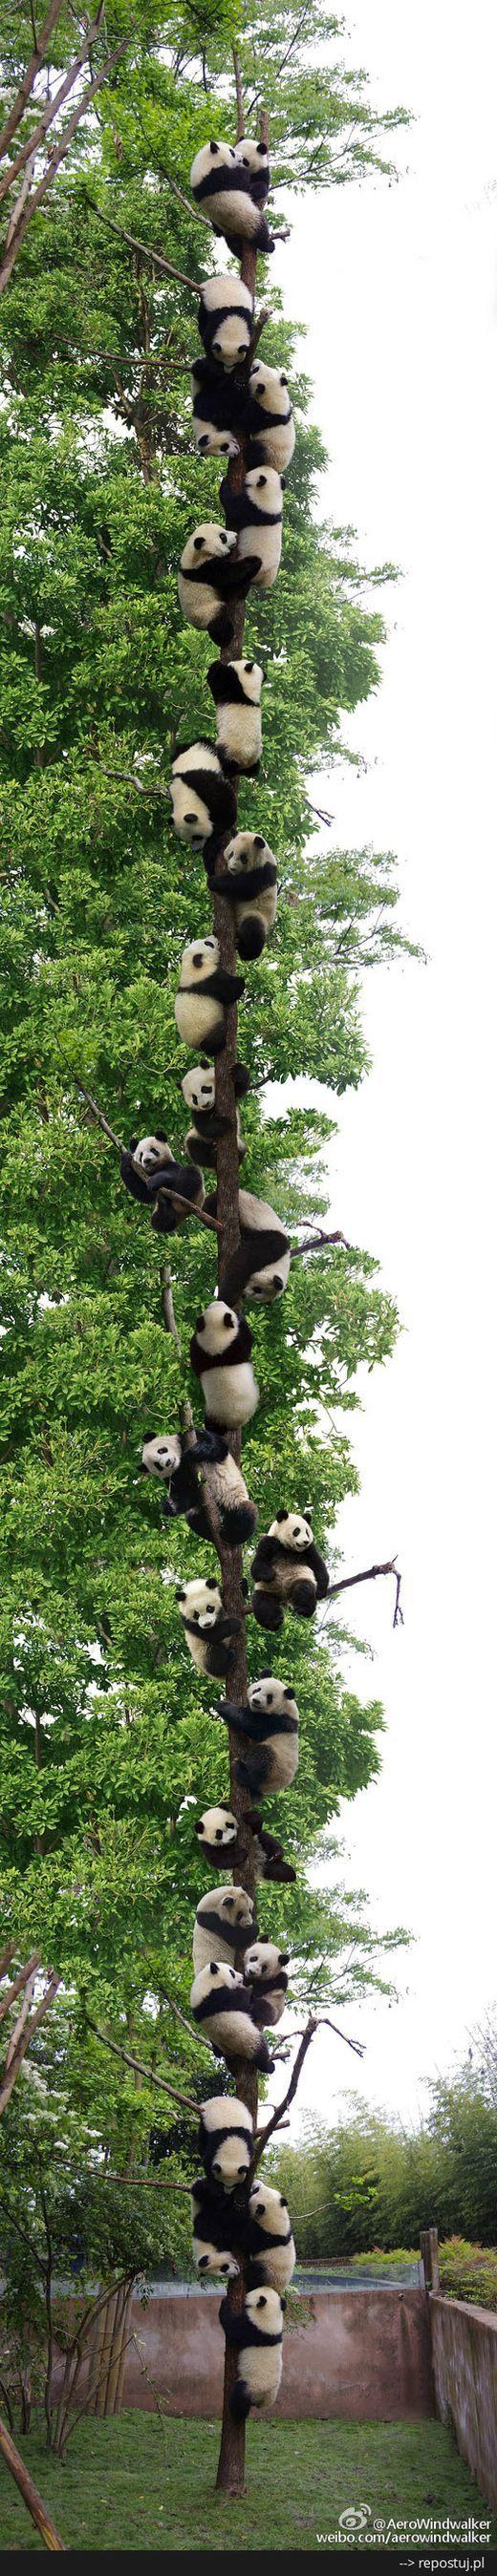 A tree full of pandas.